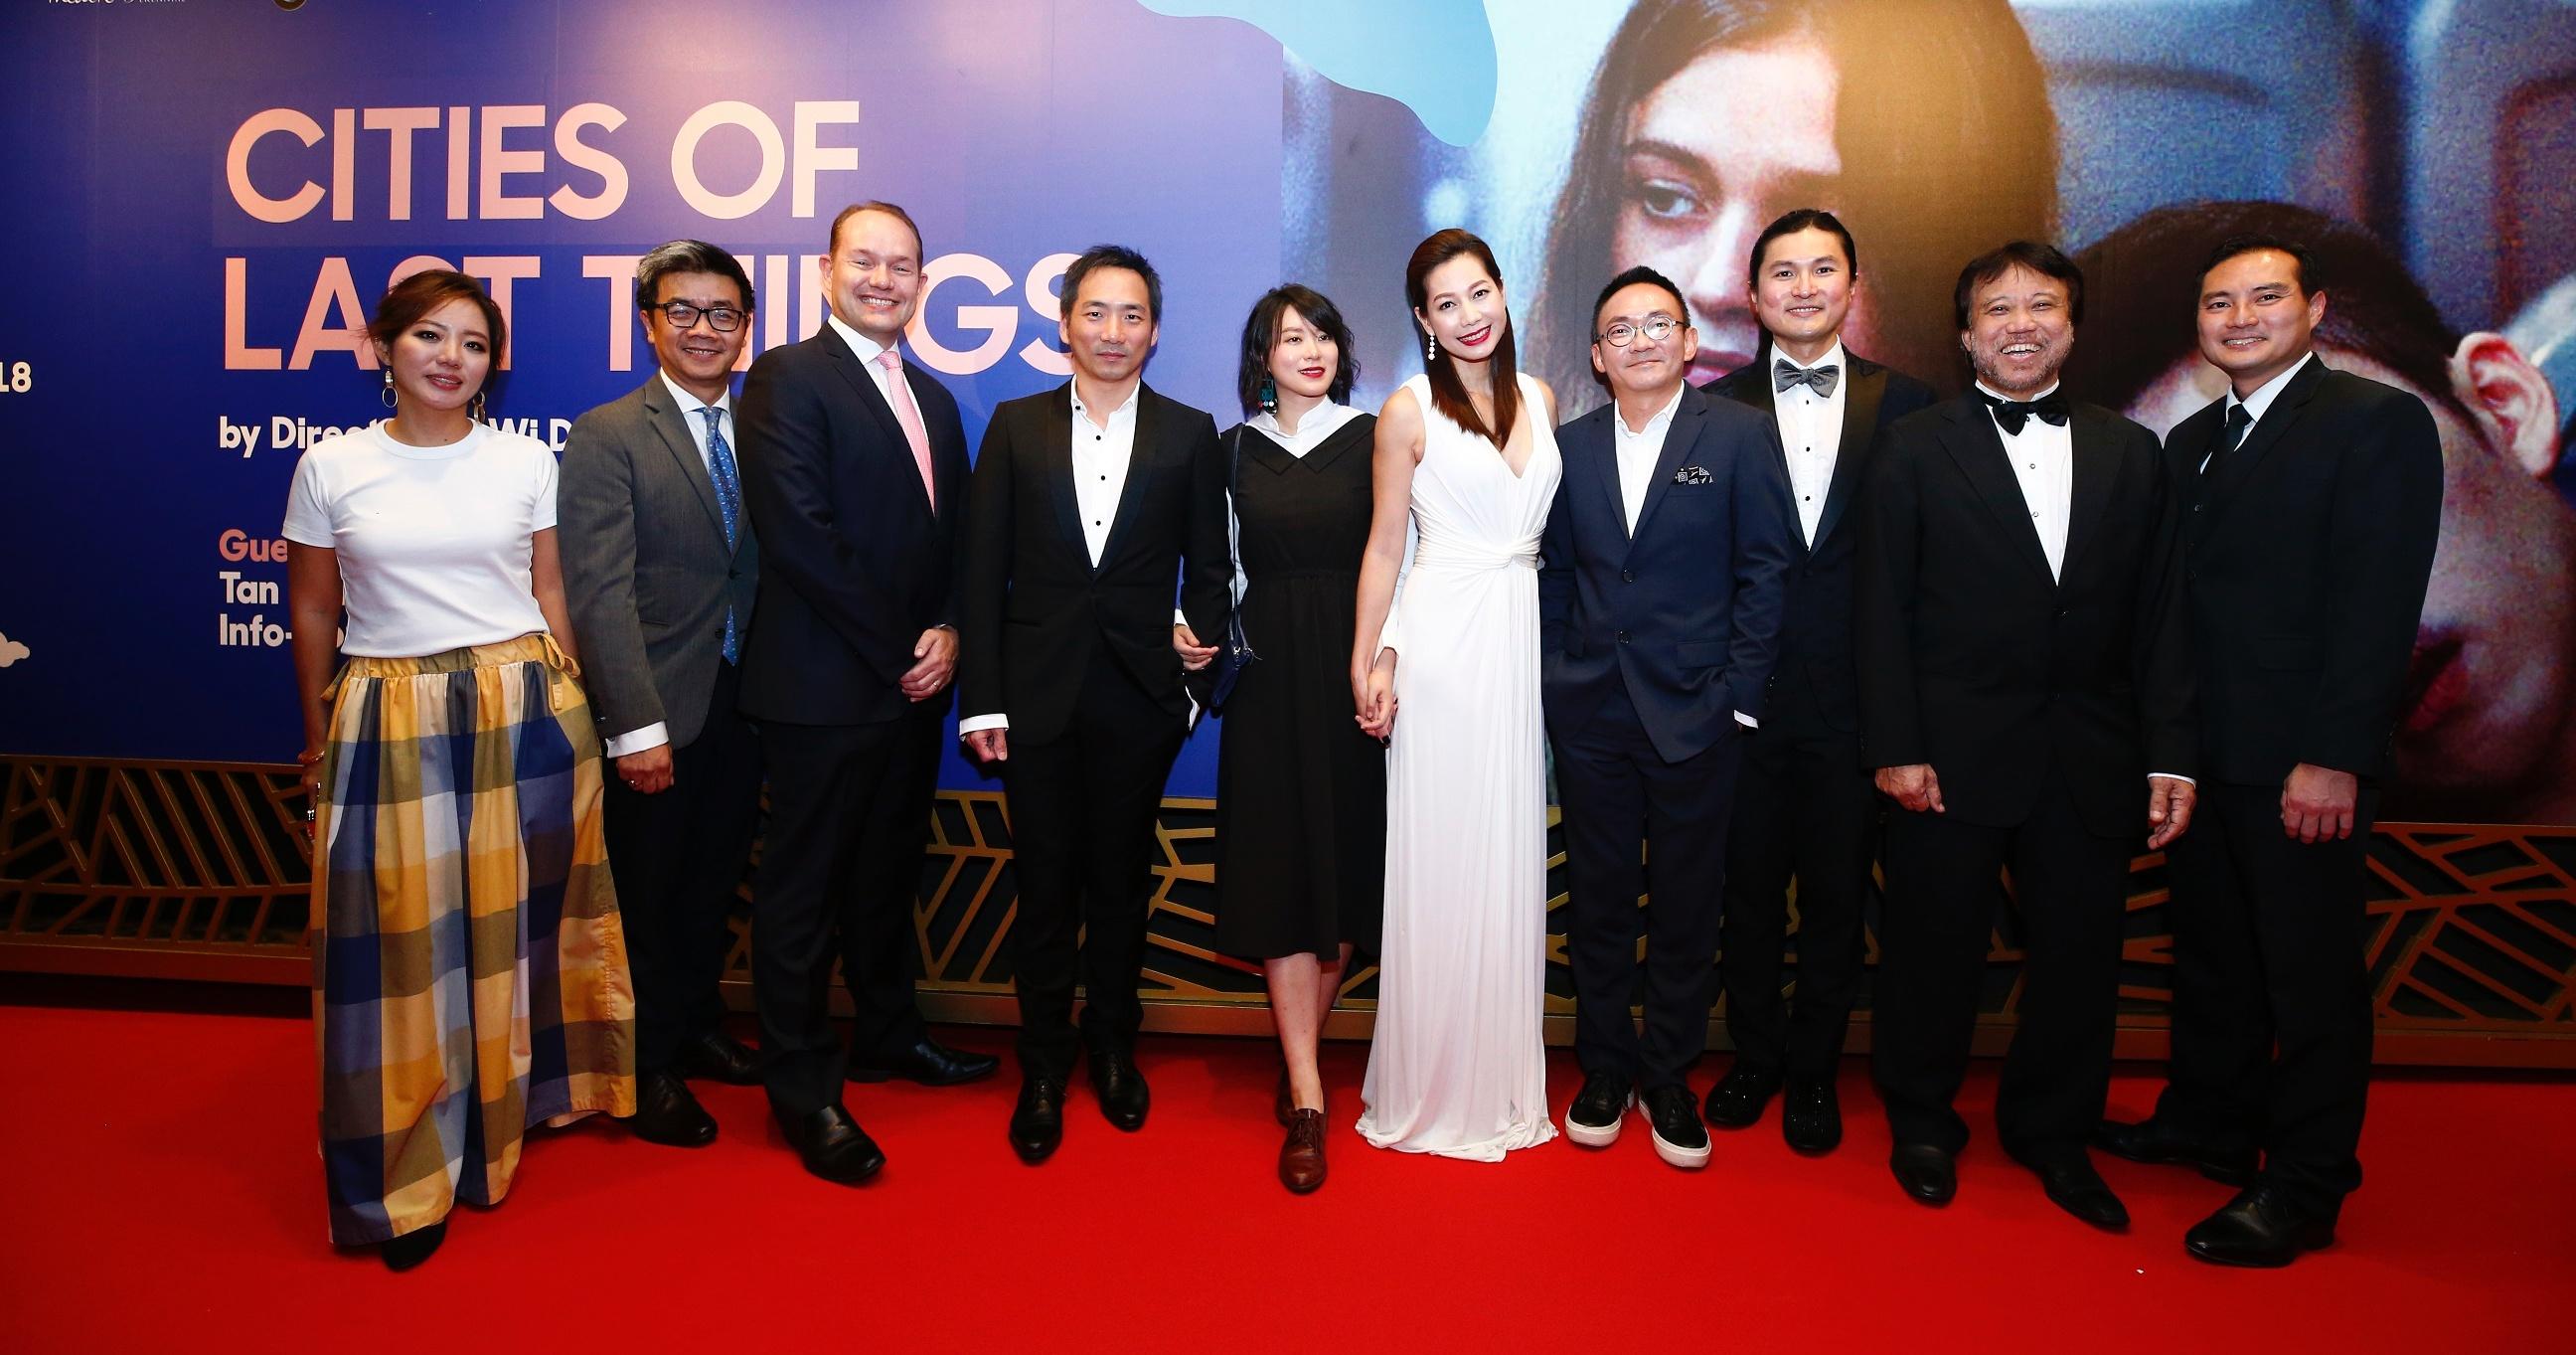 opening_of_singapore_media_festival_2018_-_image_credit_to_sgiff.jpg